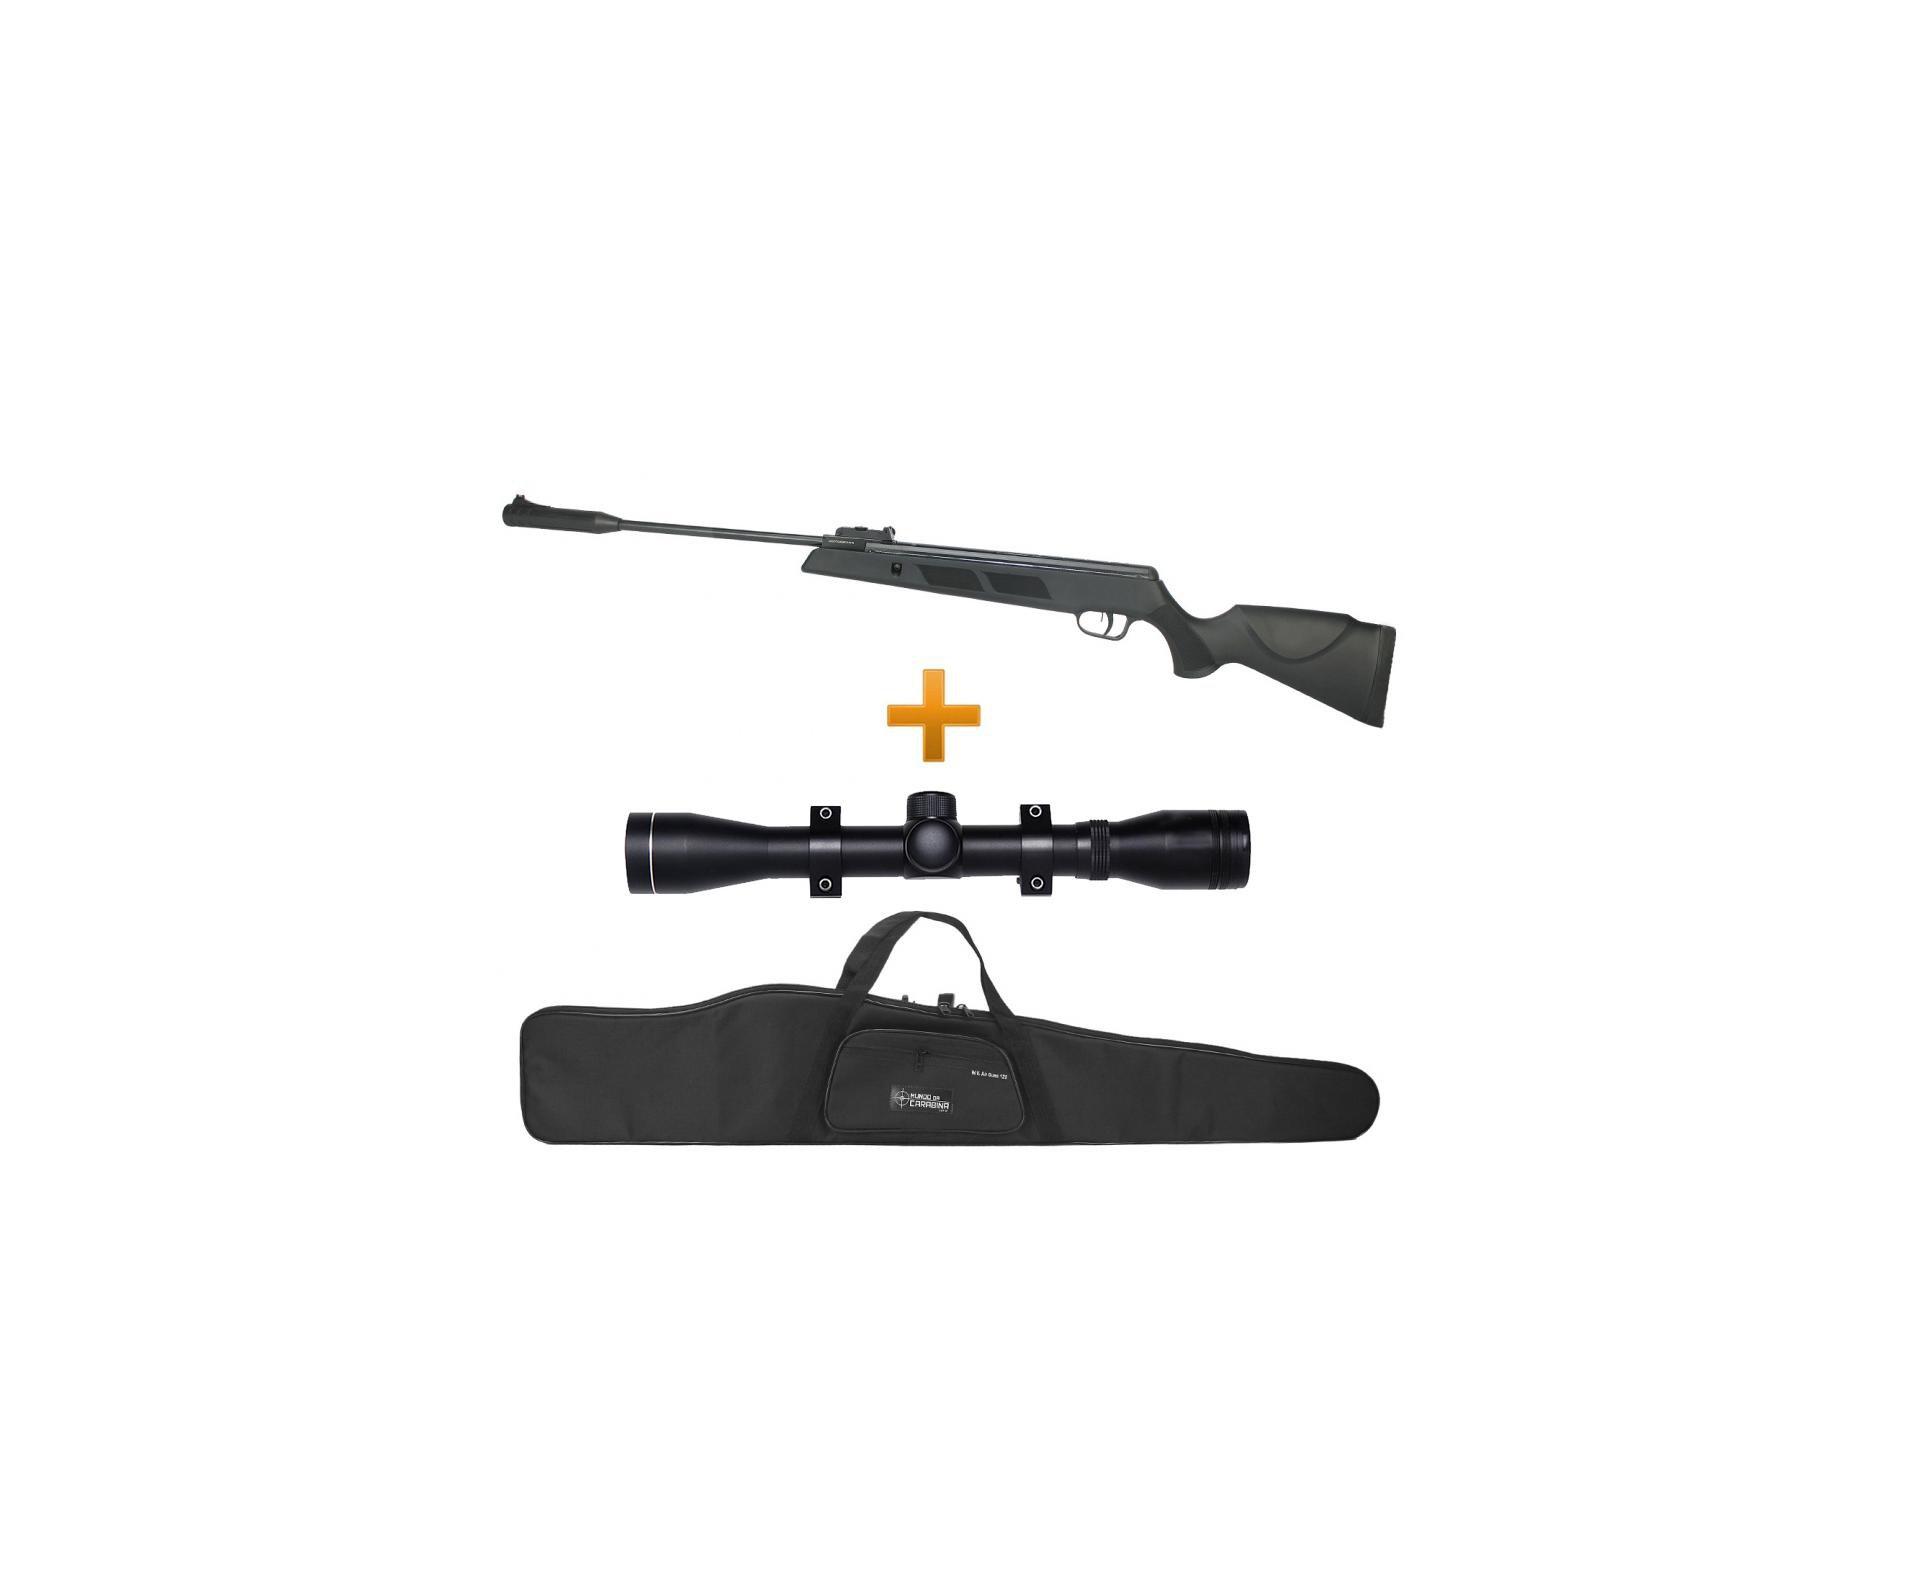 Carabina De Pressão Black Hawk 4,5 + Luneta 4x32 + Capa - Artemis Fixxar